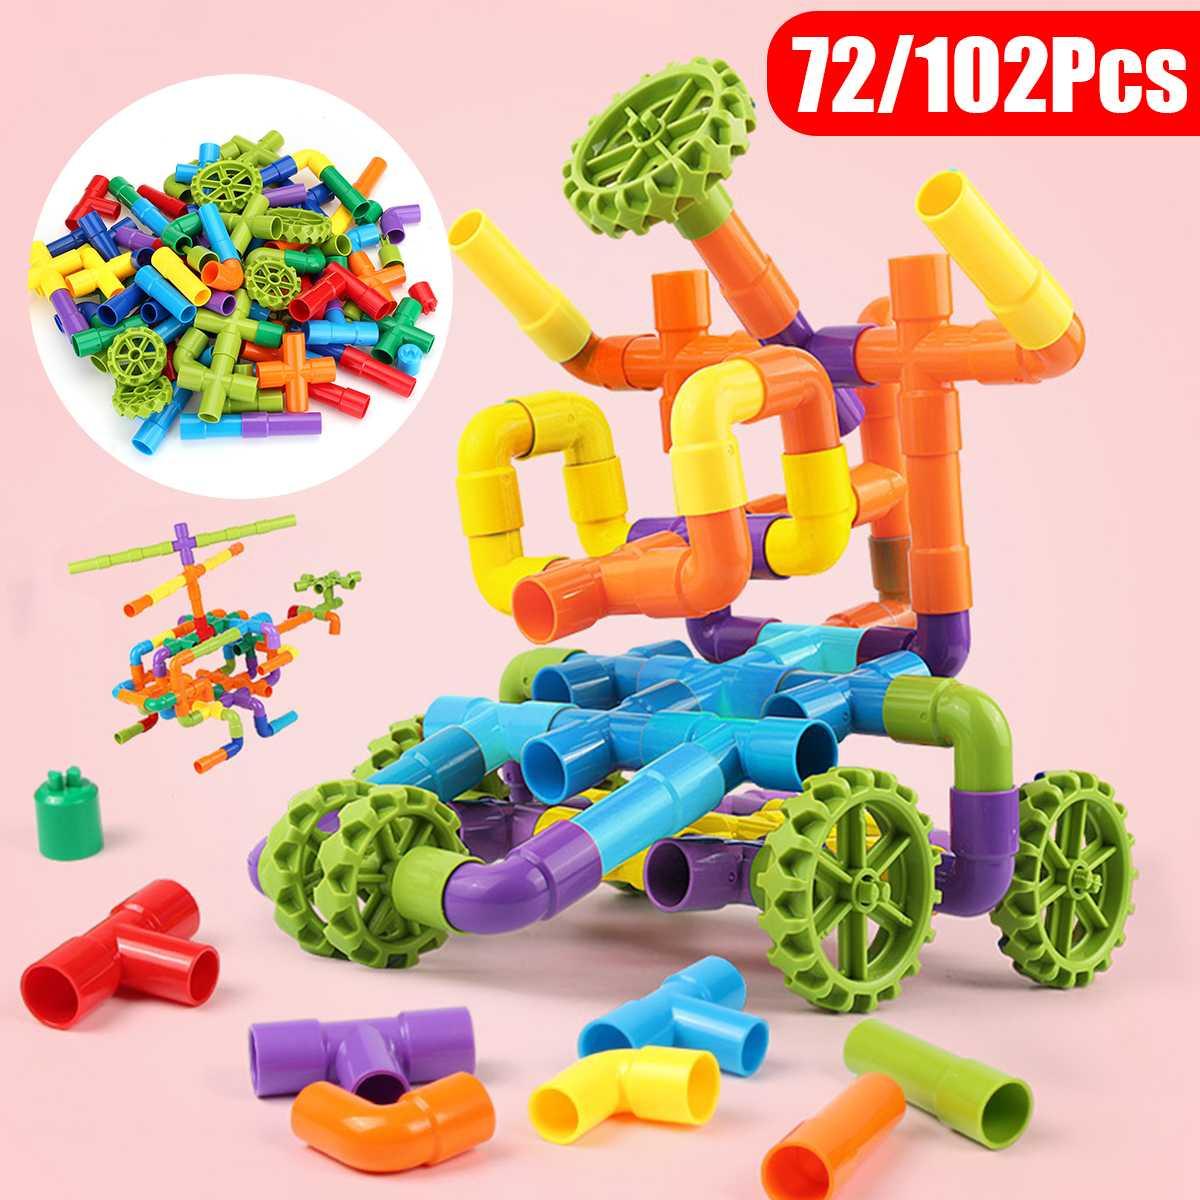 72pcs 102Pcs 3D Model Building Blocks DIY Building Blocks House Car Robots Tubing Brick For Baby Child Gift TOY